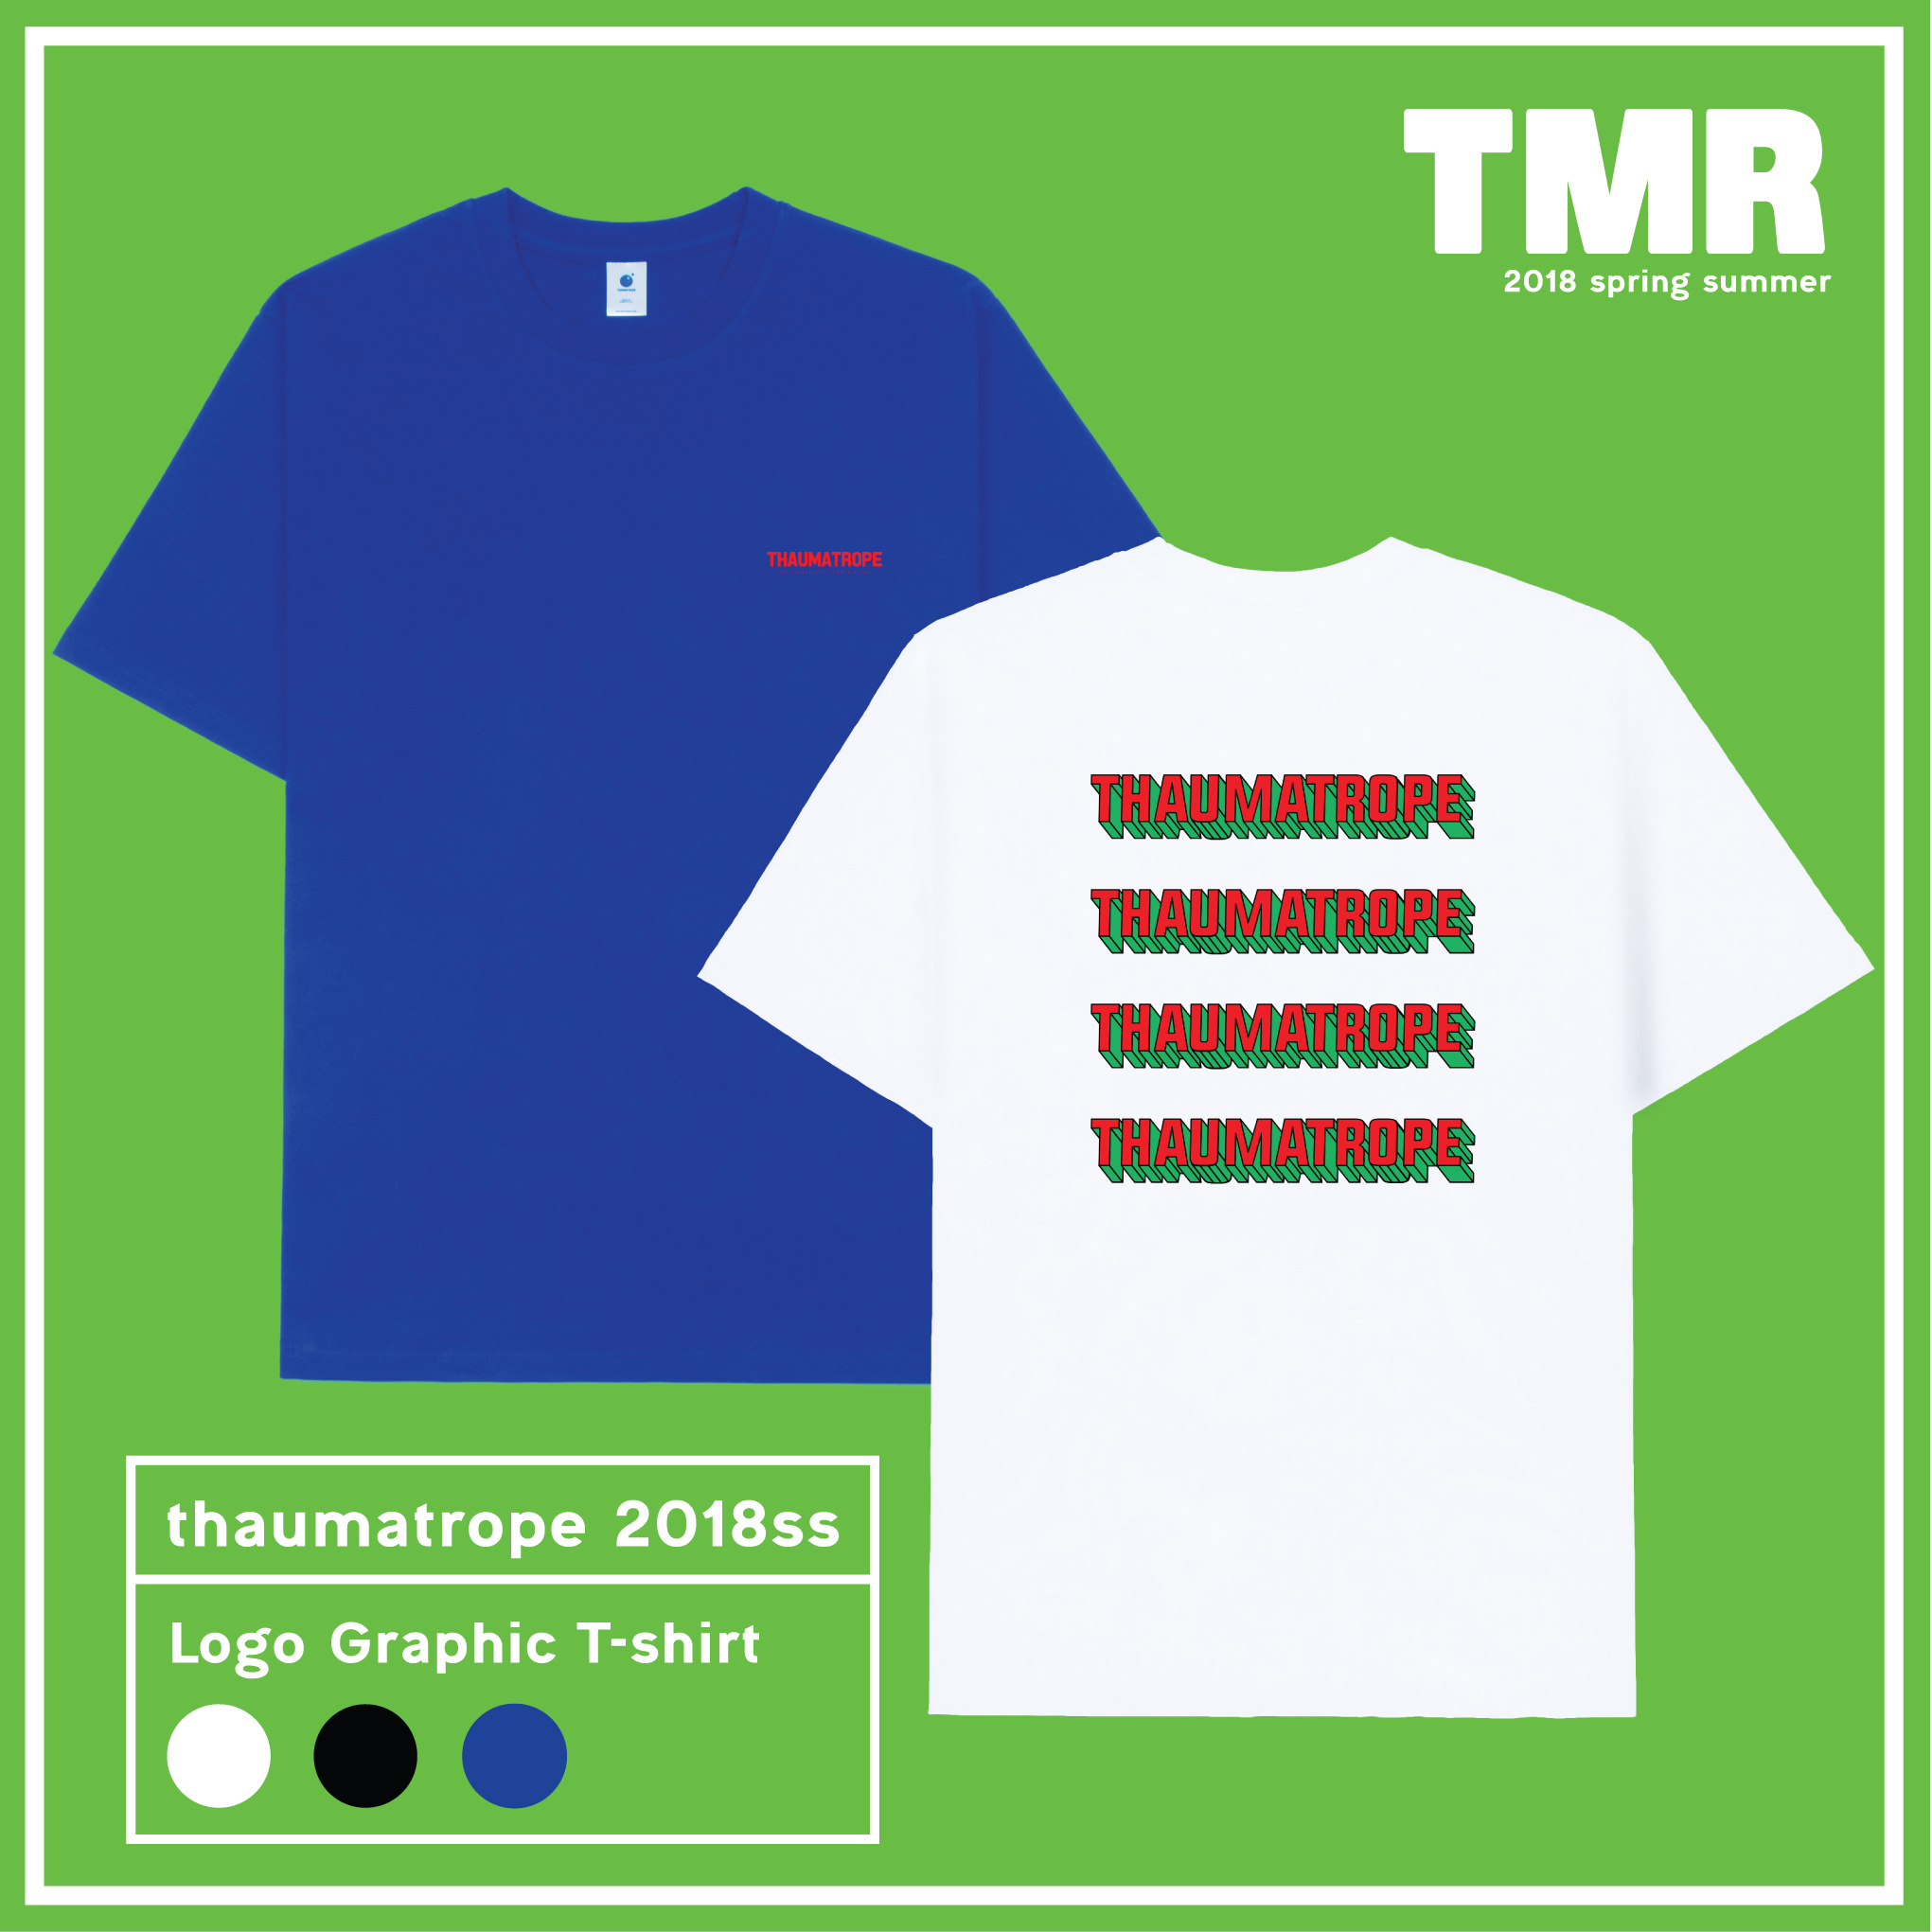 TMR LOGO GRAPHIC T-SHIRTS